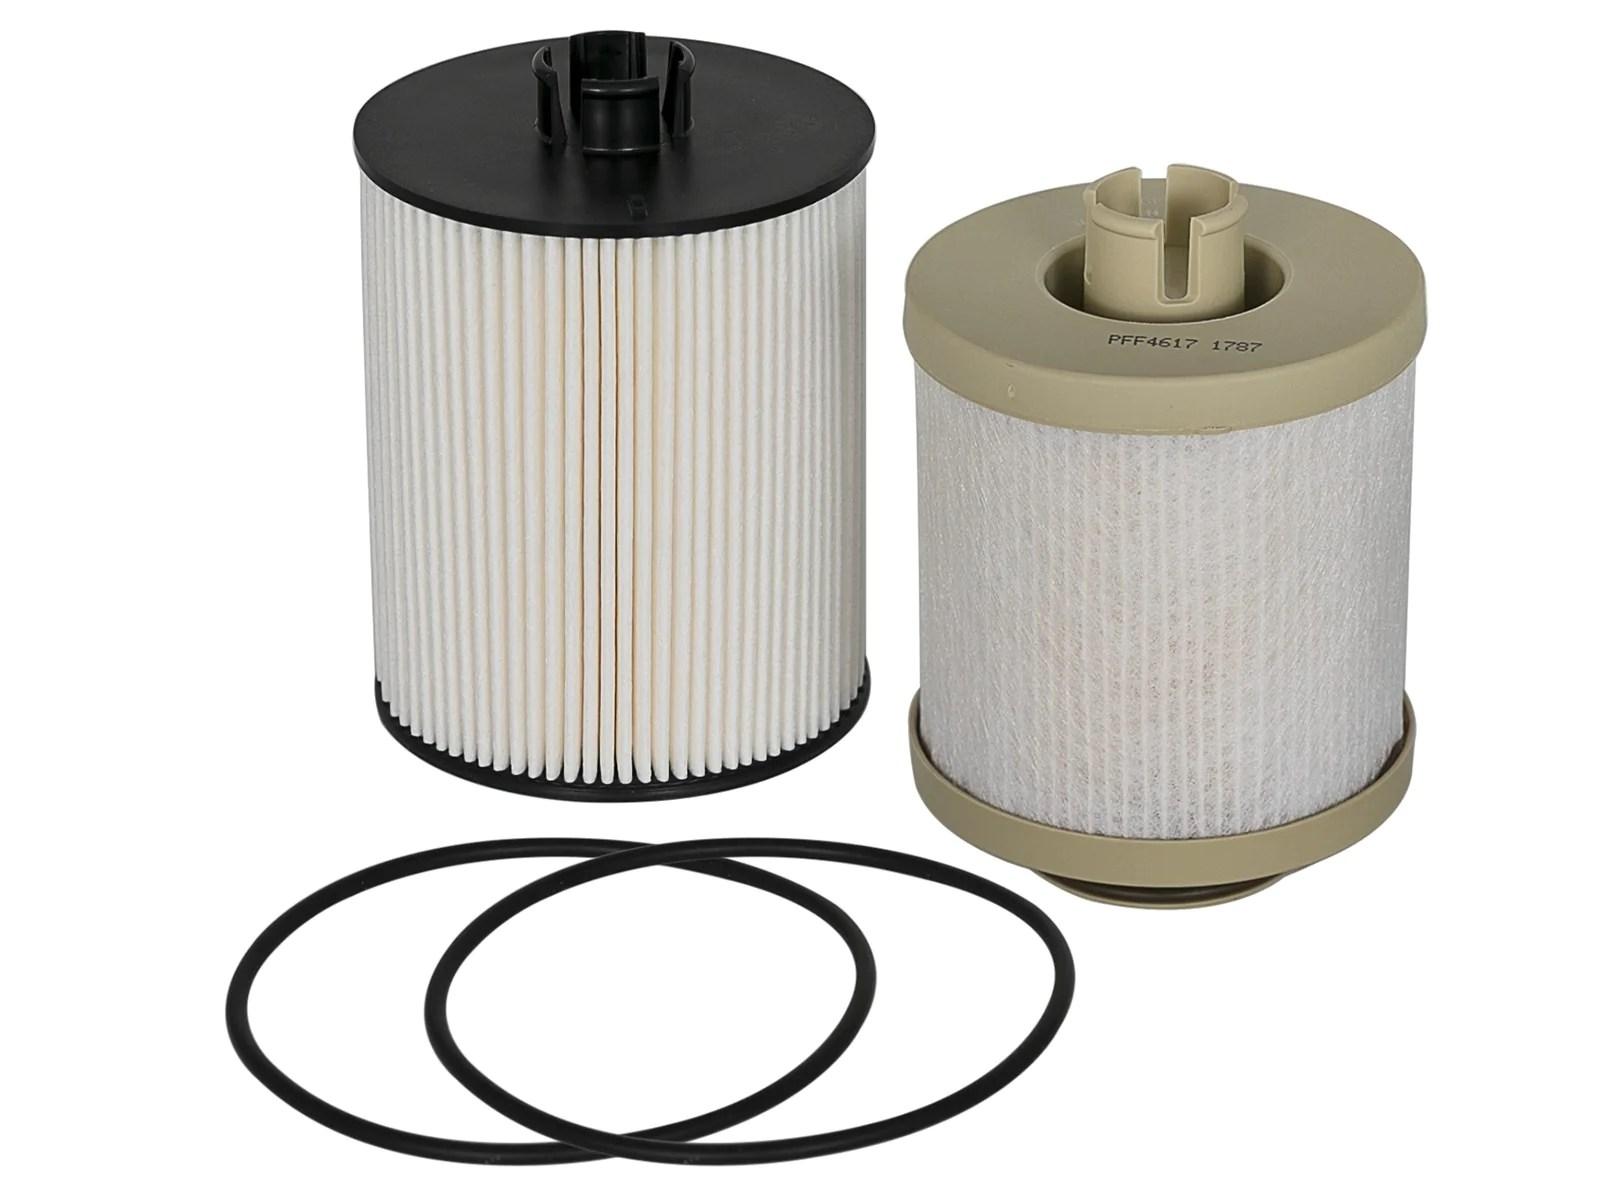 afe power pro guard d2 fuel filter northwest diesel [ 1600 x 1200 Pixel ]